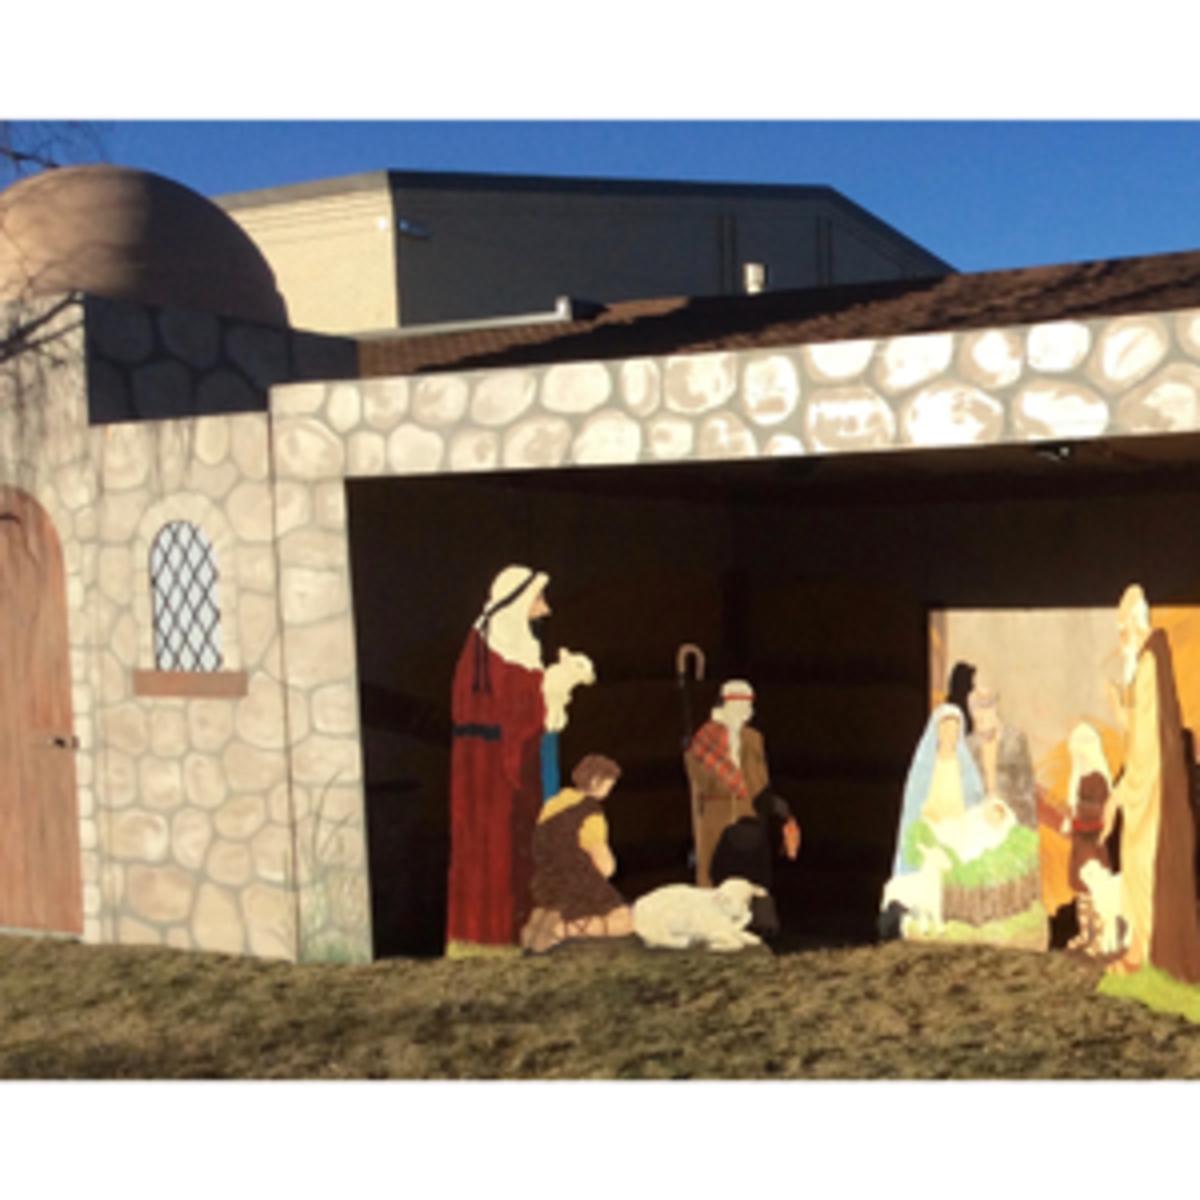 7-annual-nativity-six-figurine-display